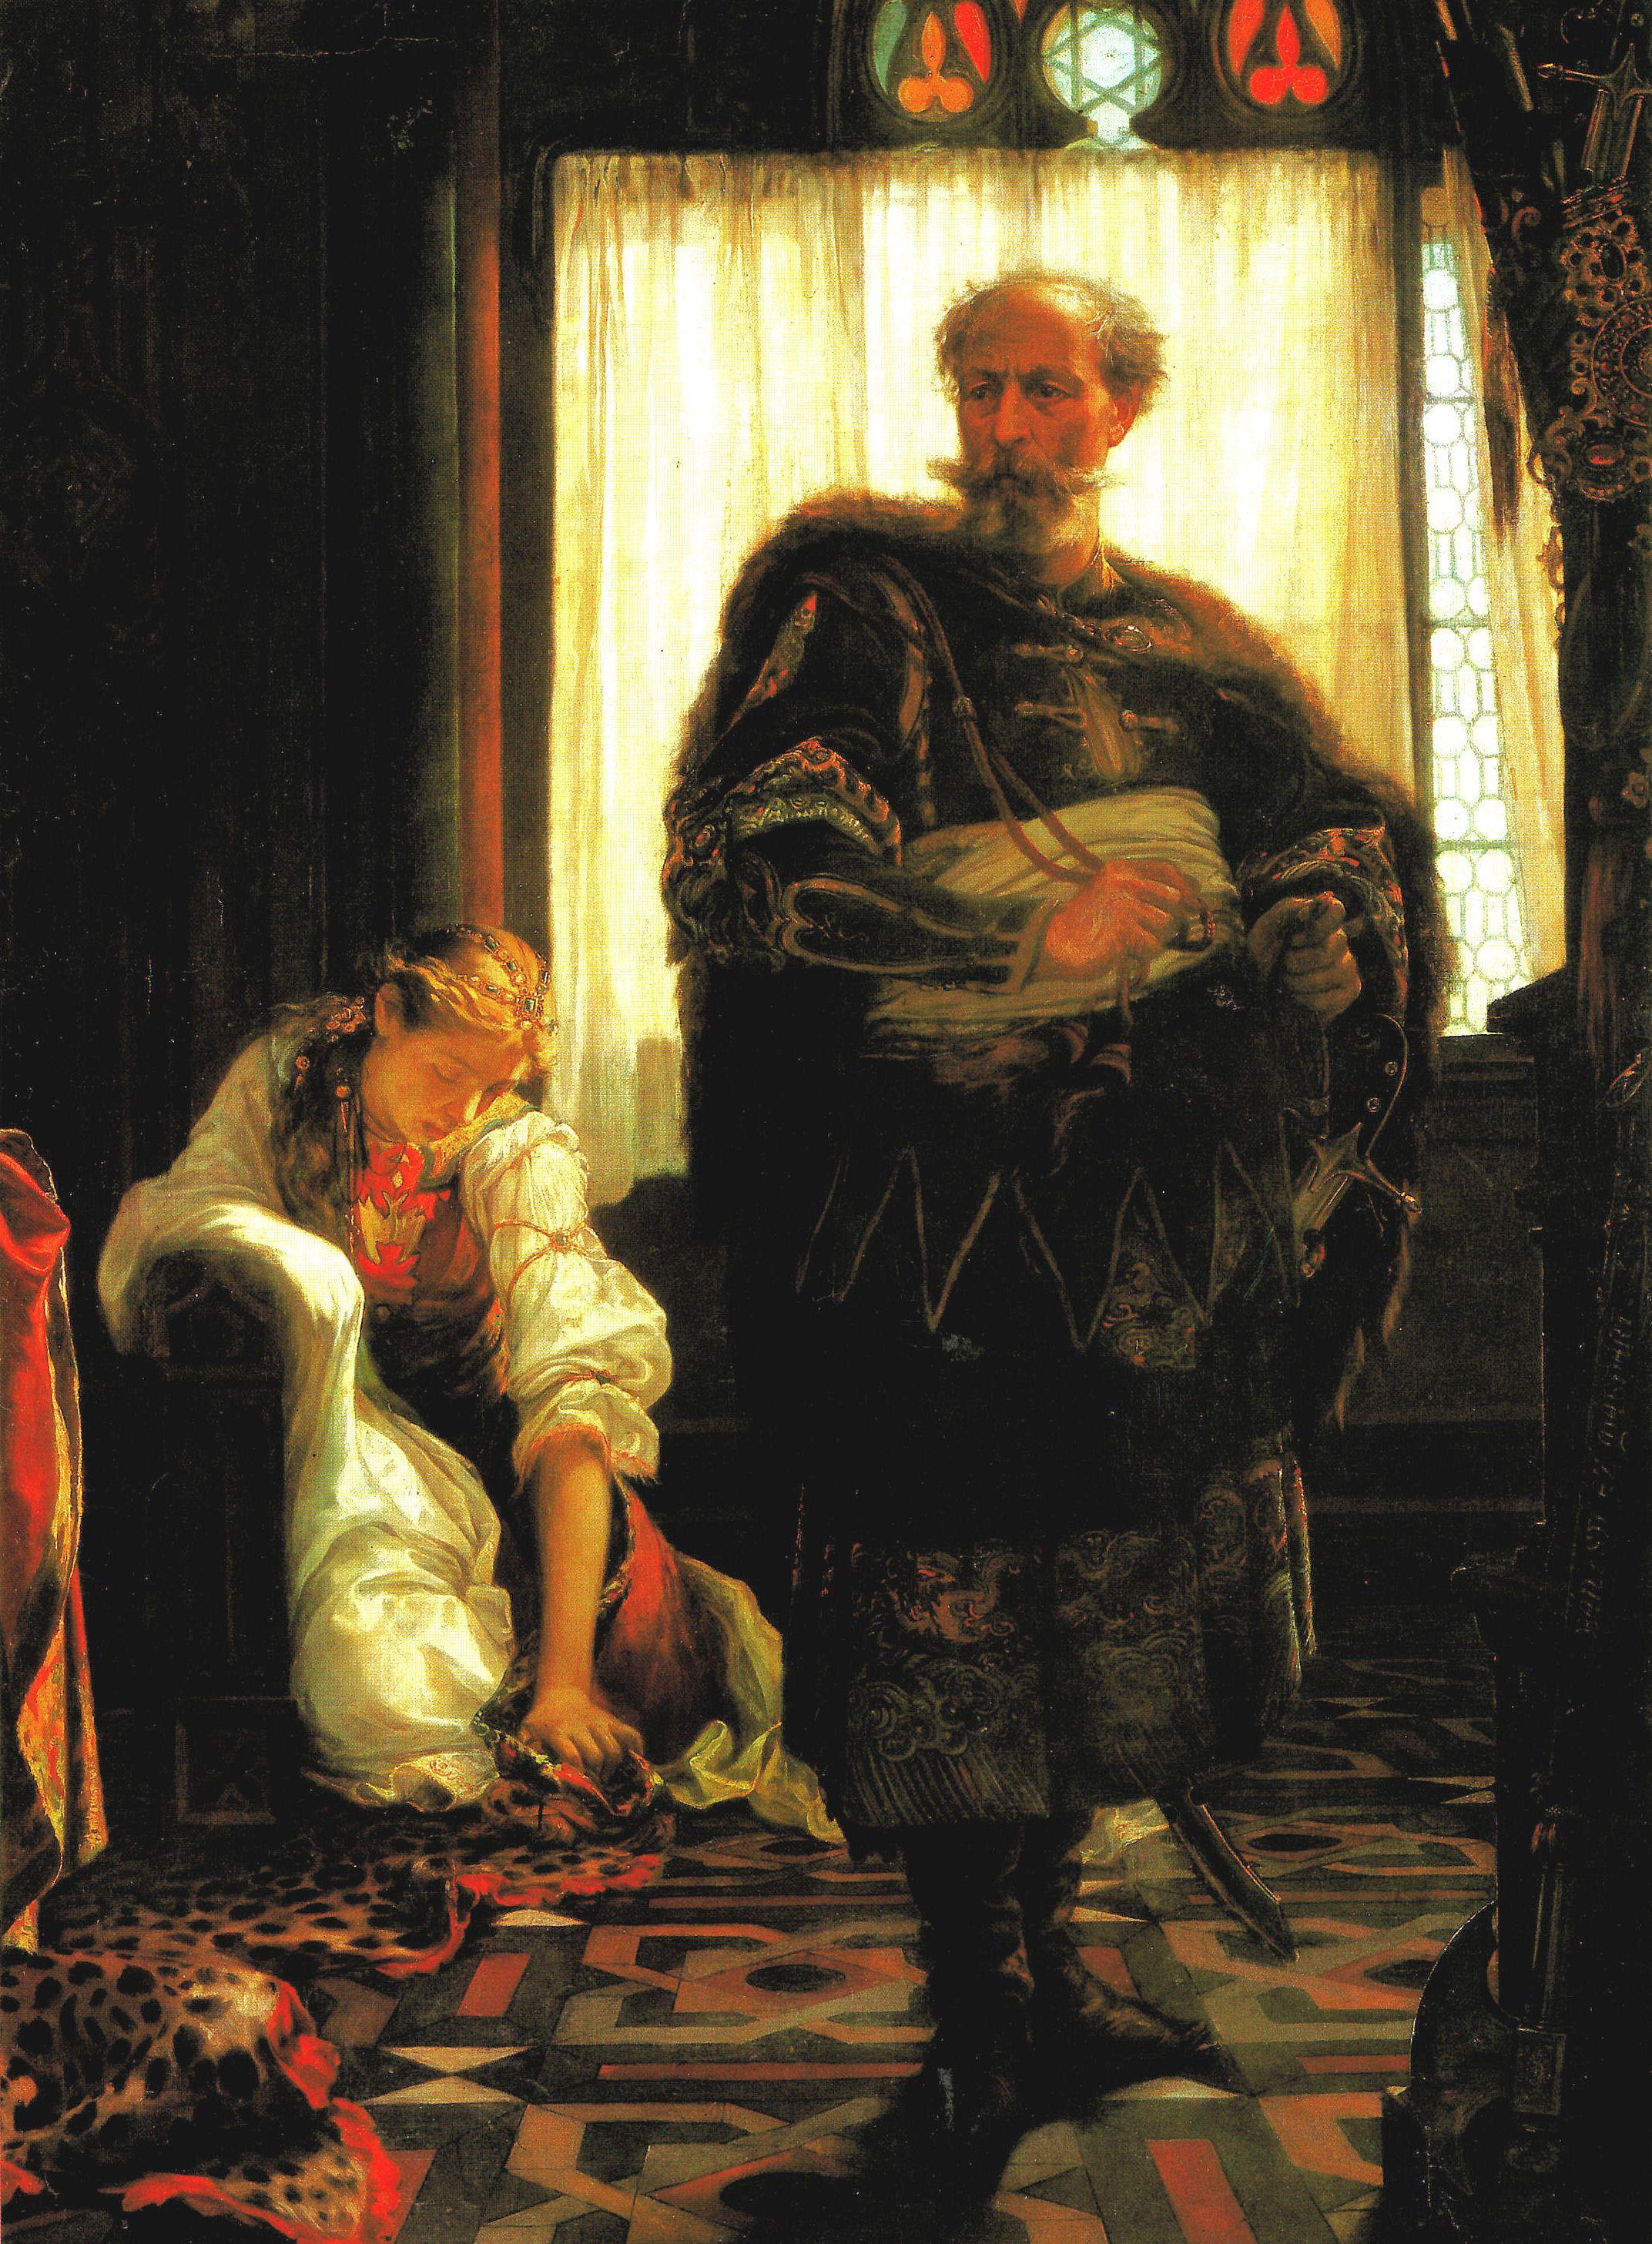 Klara w cieniu ojca. Obraz Viktora Madarásza, połowa XIX wieku.